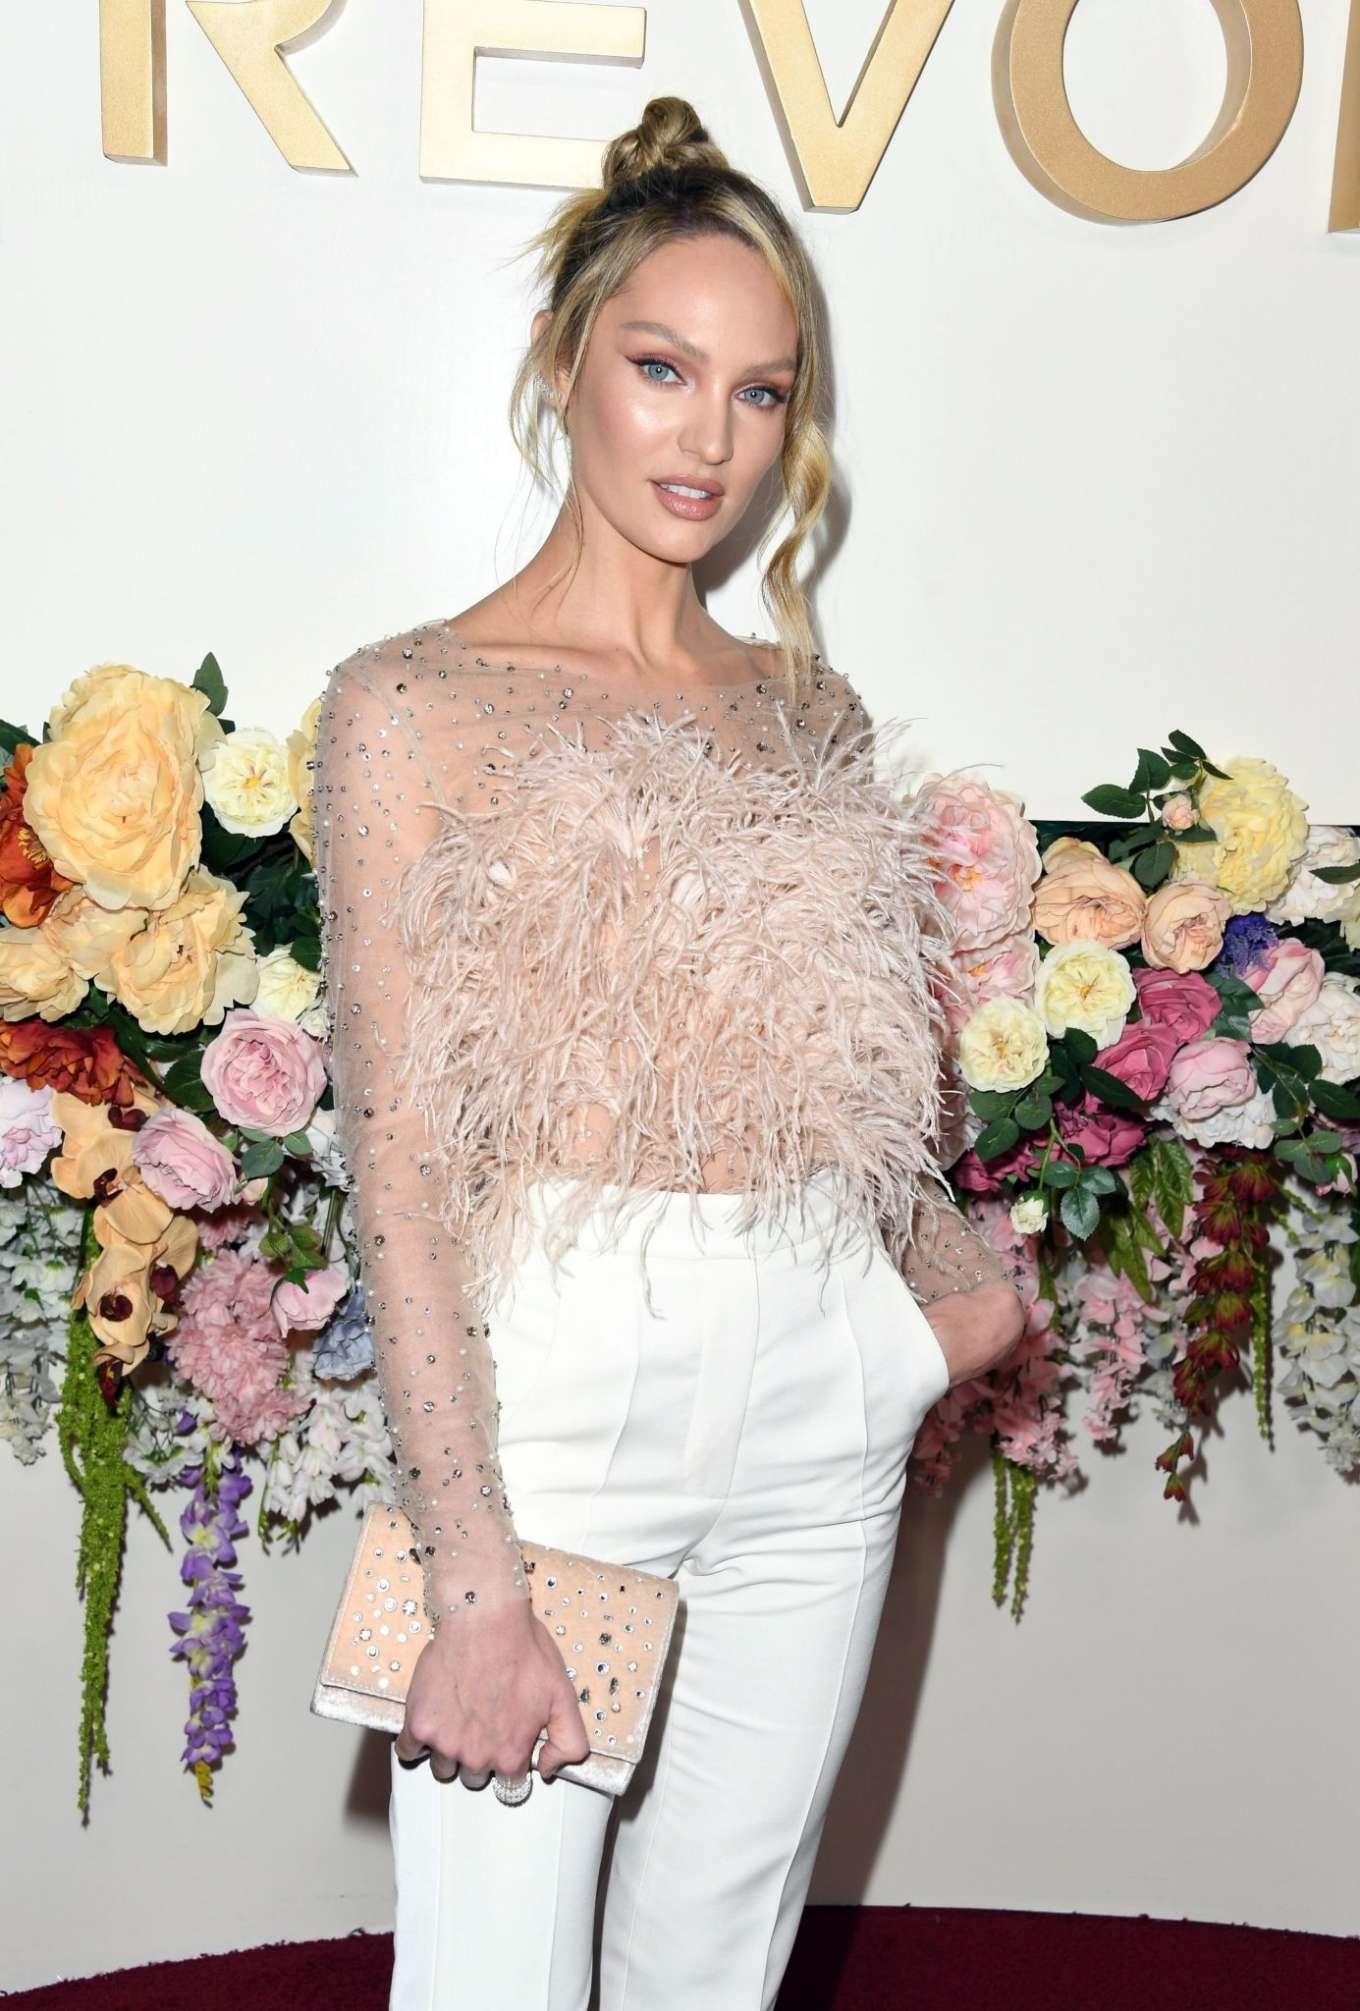 Candice Swanepoel 2019 : Candice Swanepoel – 2019 REVOLVE awards in West Hollywood-06